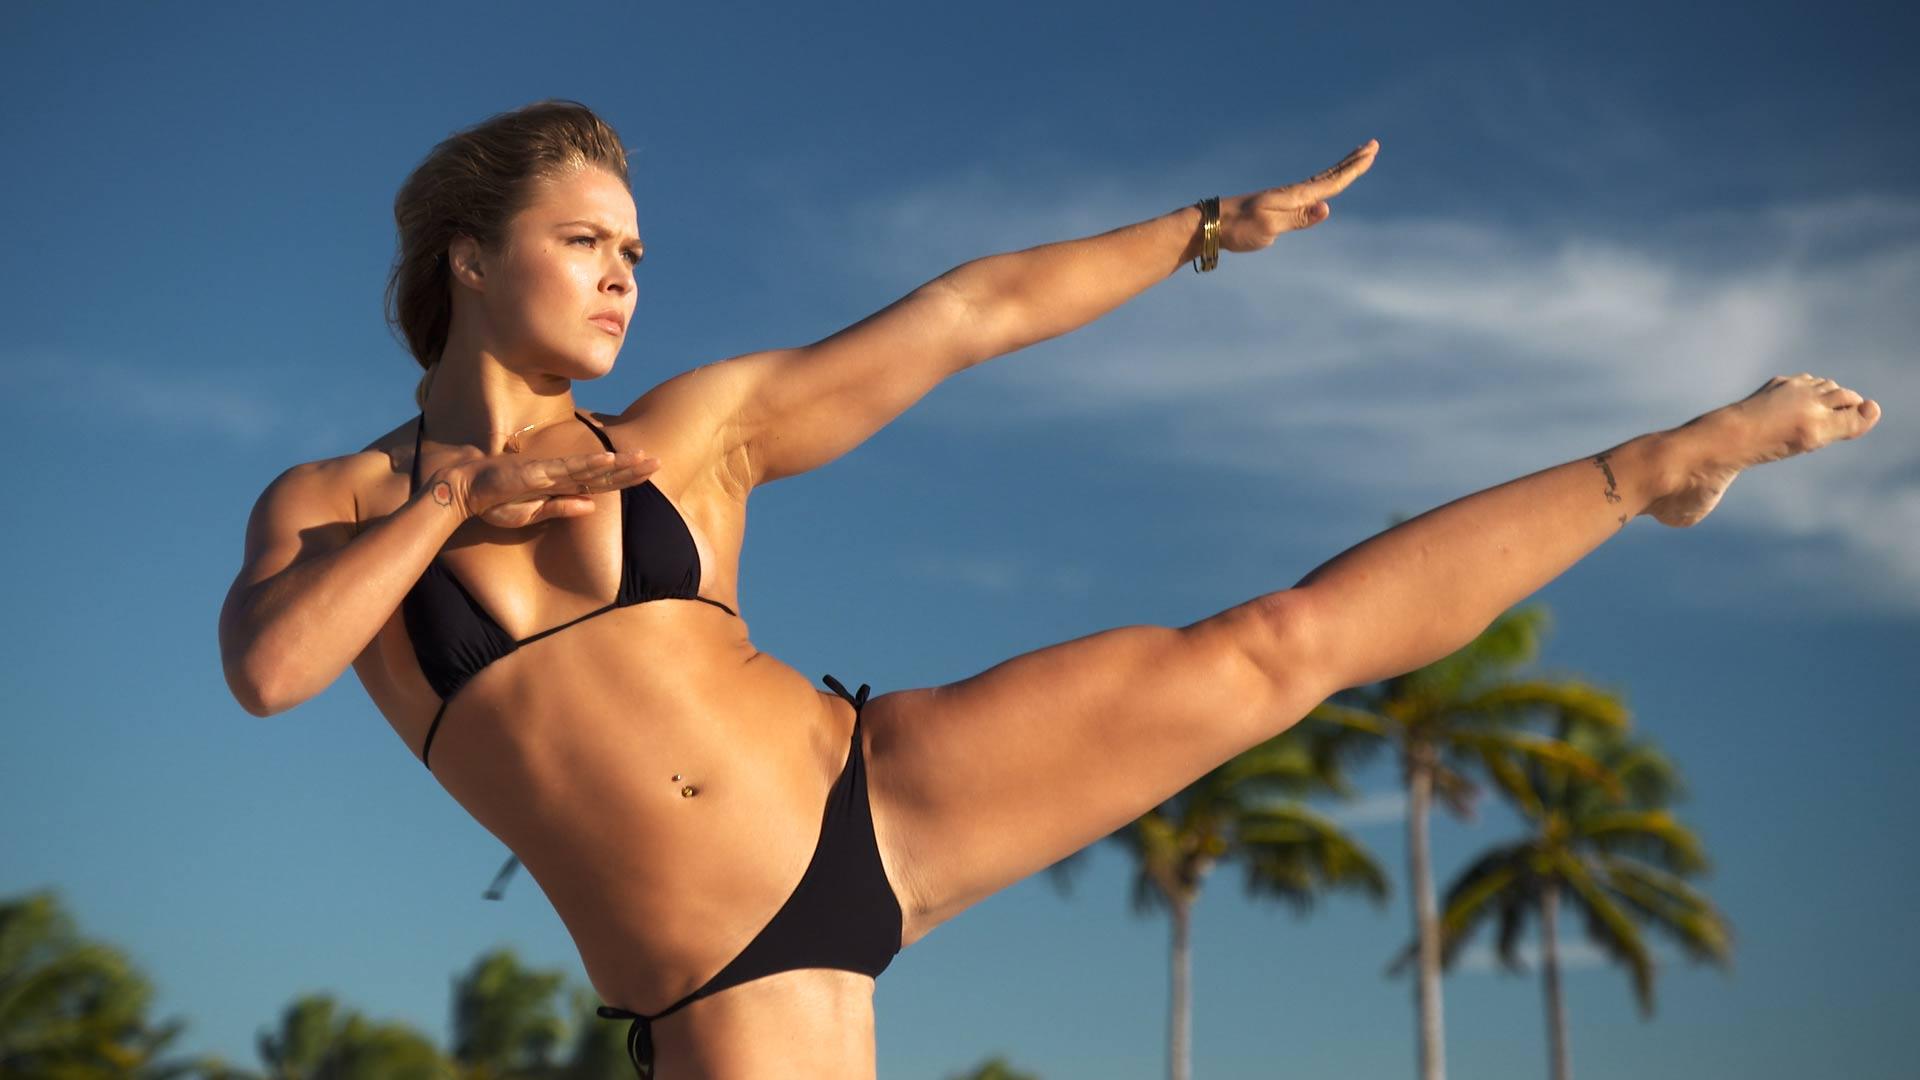 Ronda Rousey Height Weight Measurements Age Boyfriend Net Worth